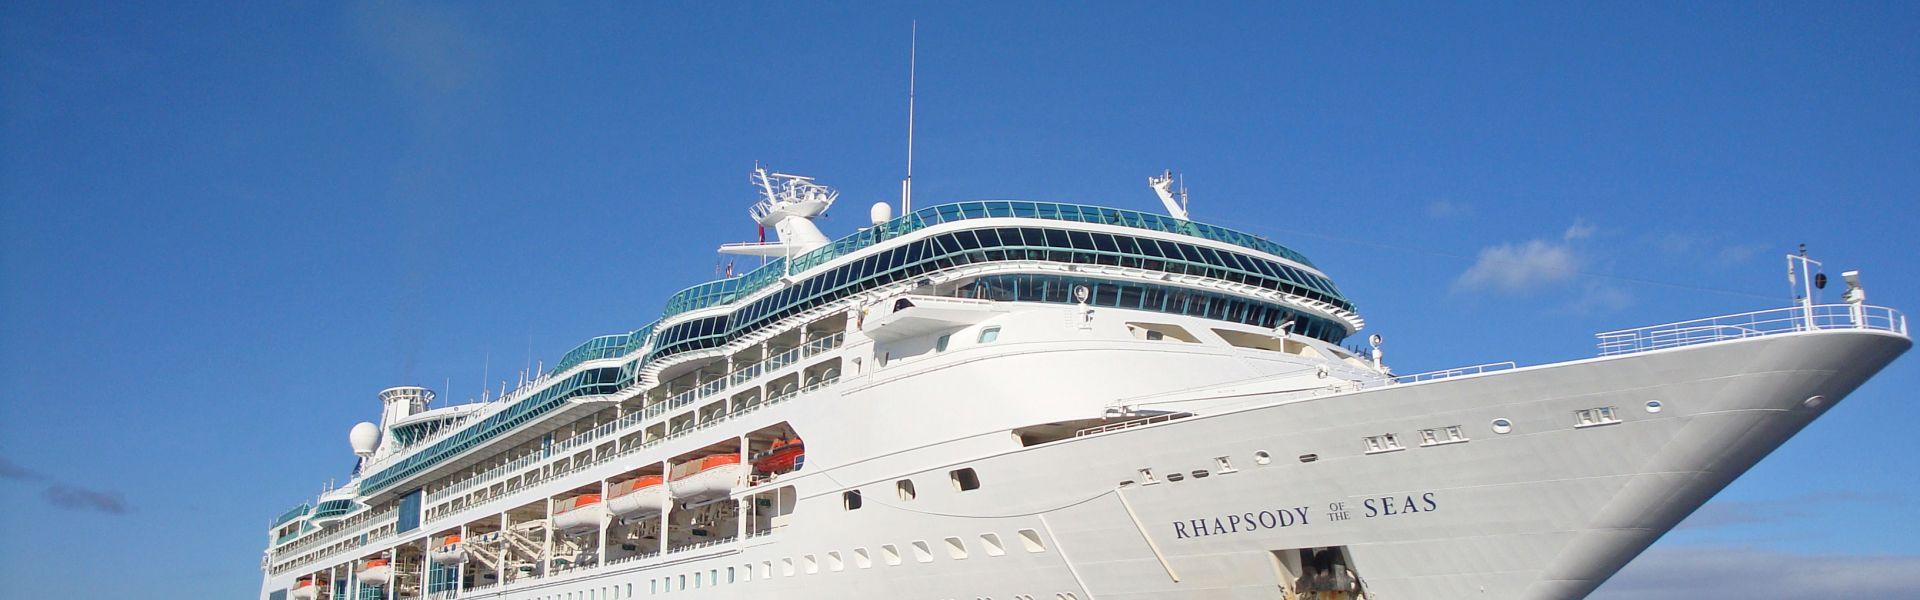 Croaziere 2017 - Transatlantic si Repozitionari (Barcelona) - Royal Caribbean Cruise Line - Rhapsody of the Seas - 14 nopti